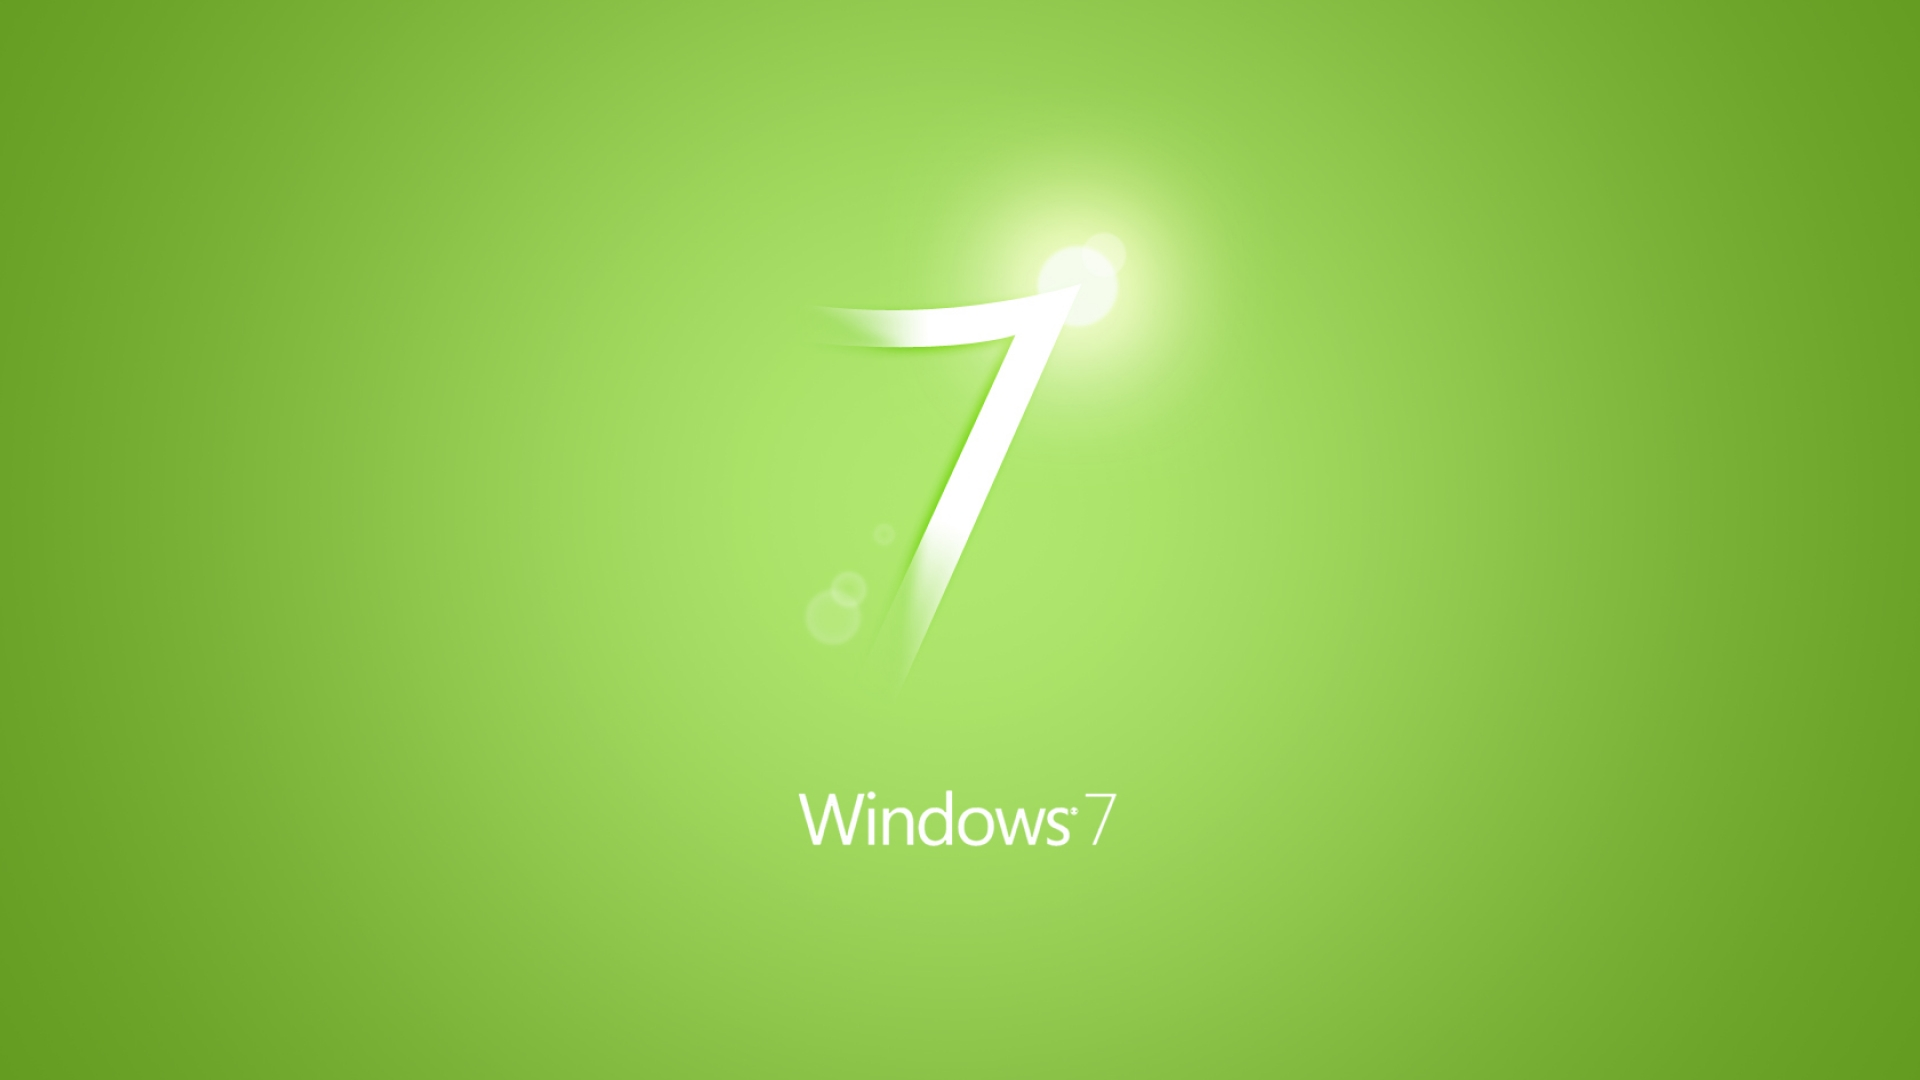 Simple green Windows 7 logo